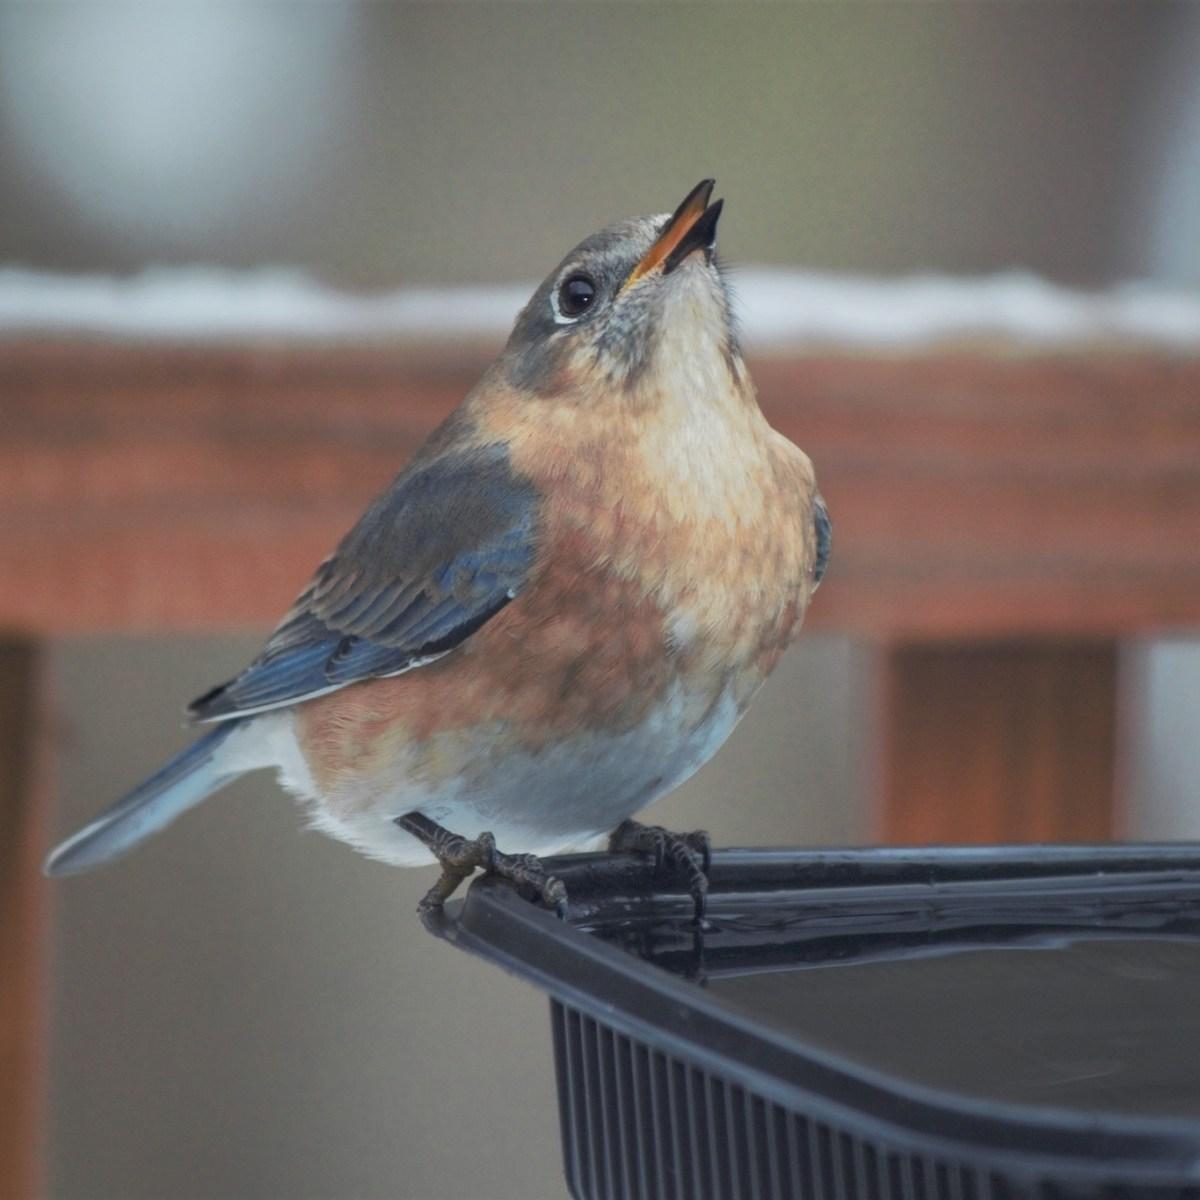 An Eastern Bluebird perched on a bird bath